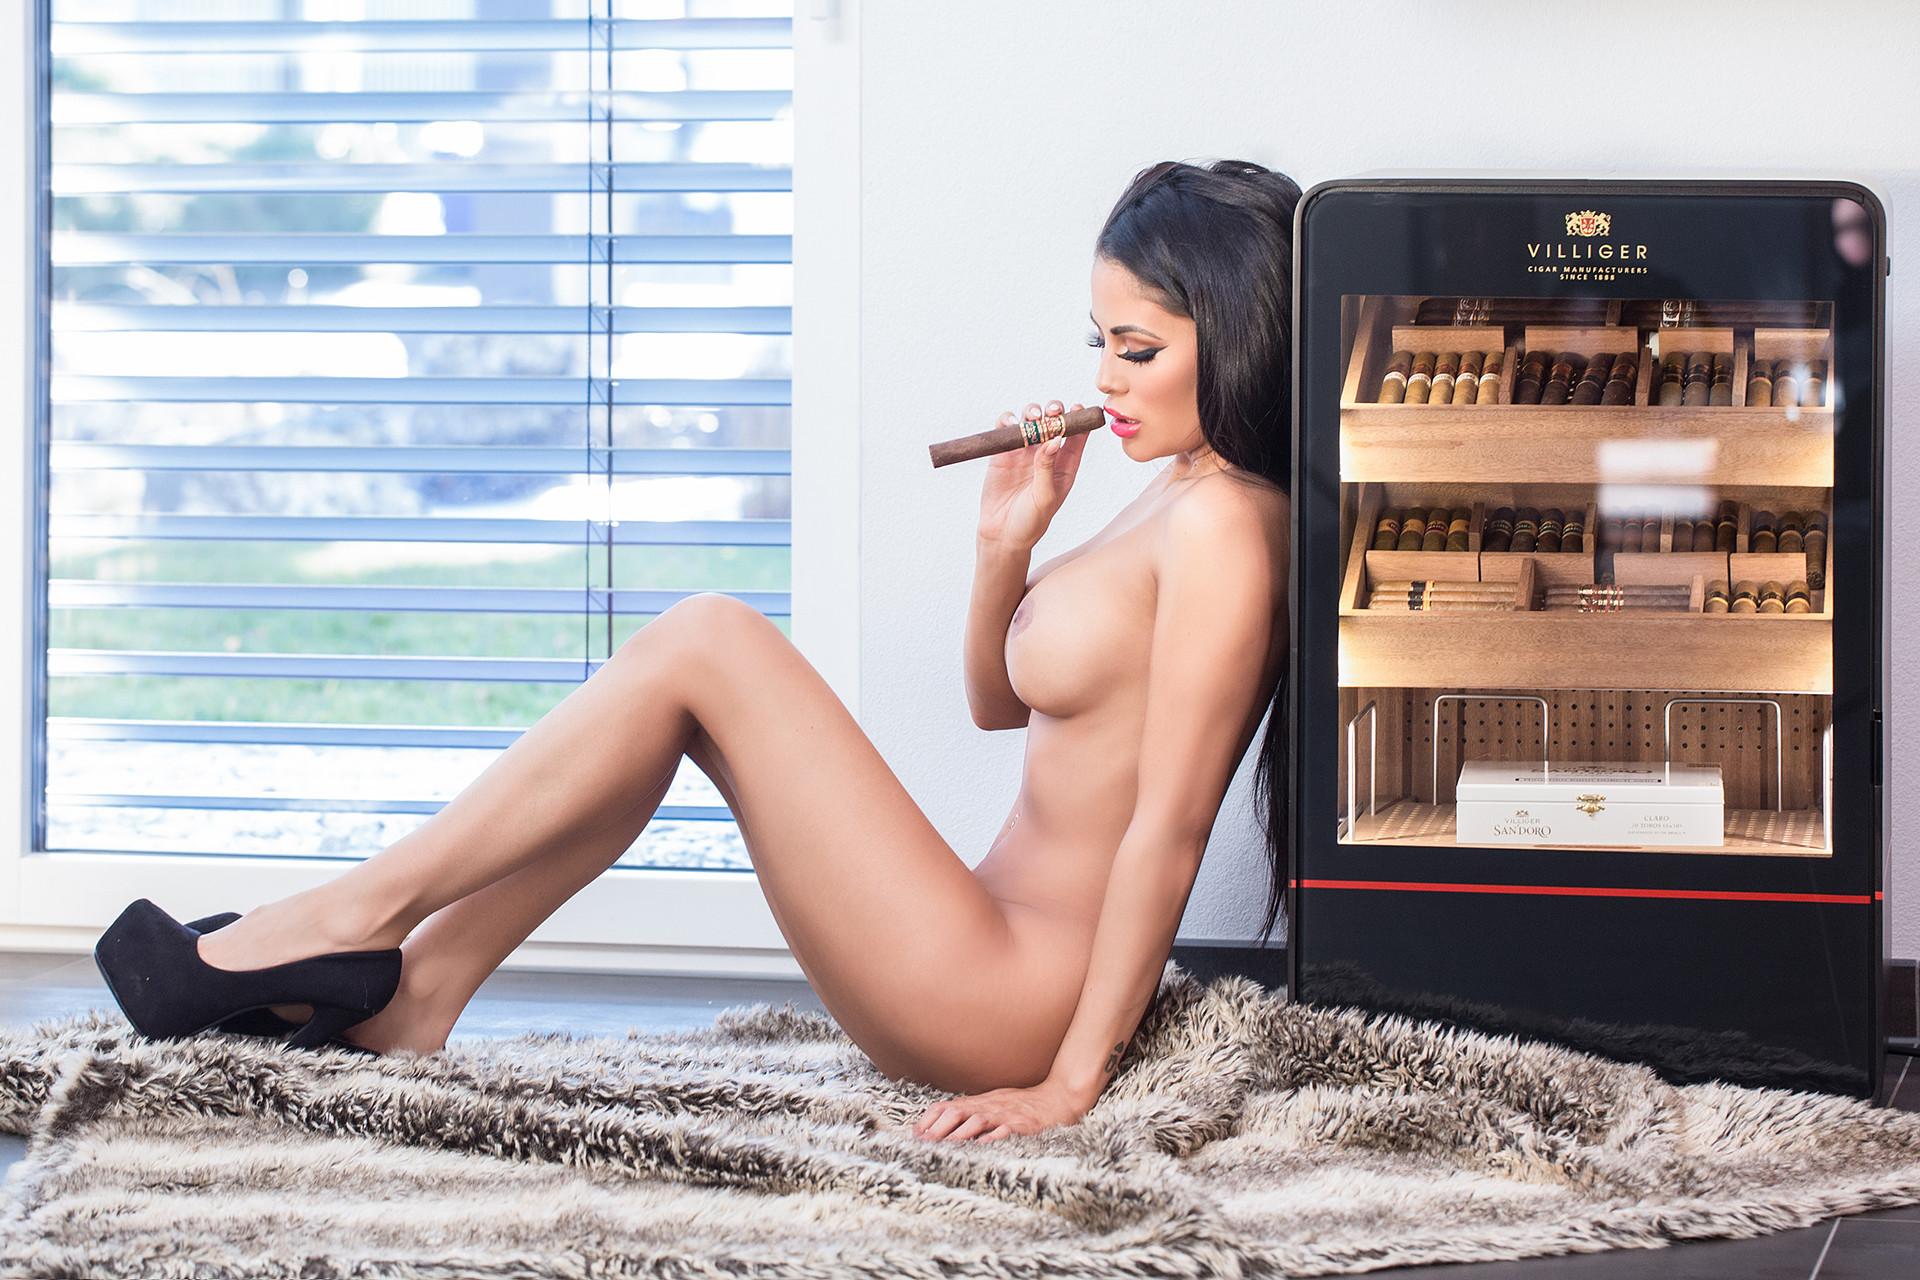 Playboy Michaela Grauke for Erotic Art Gallery / Модель Плейбоя